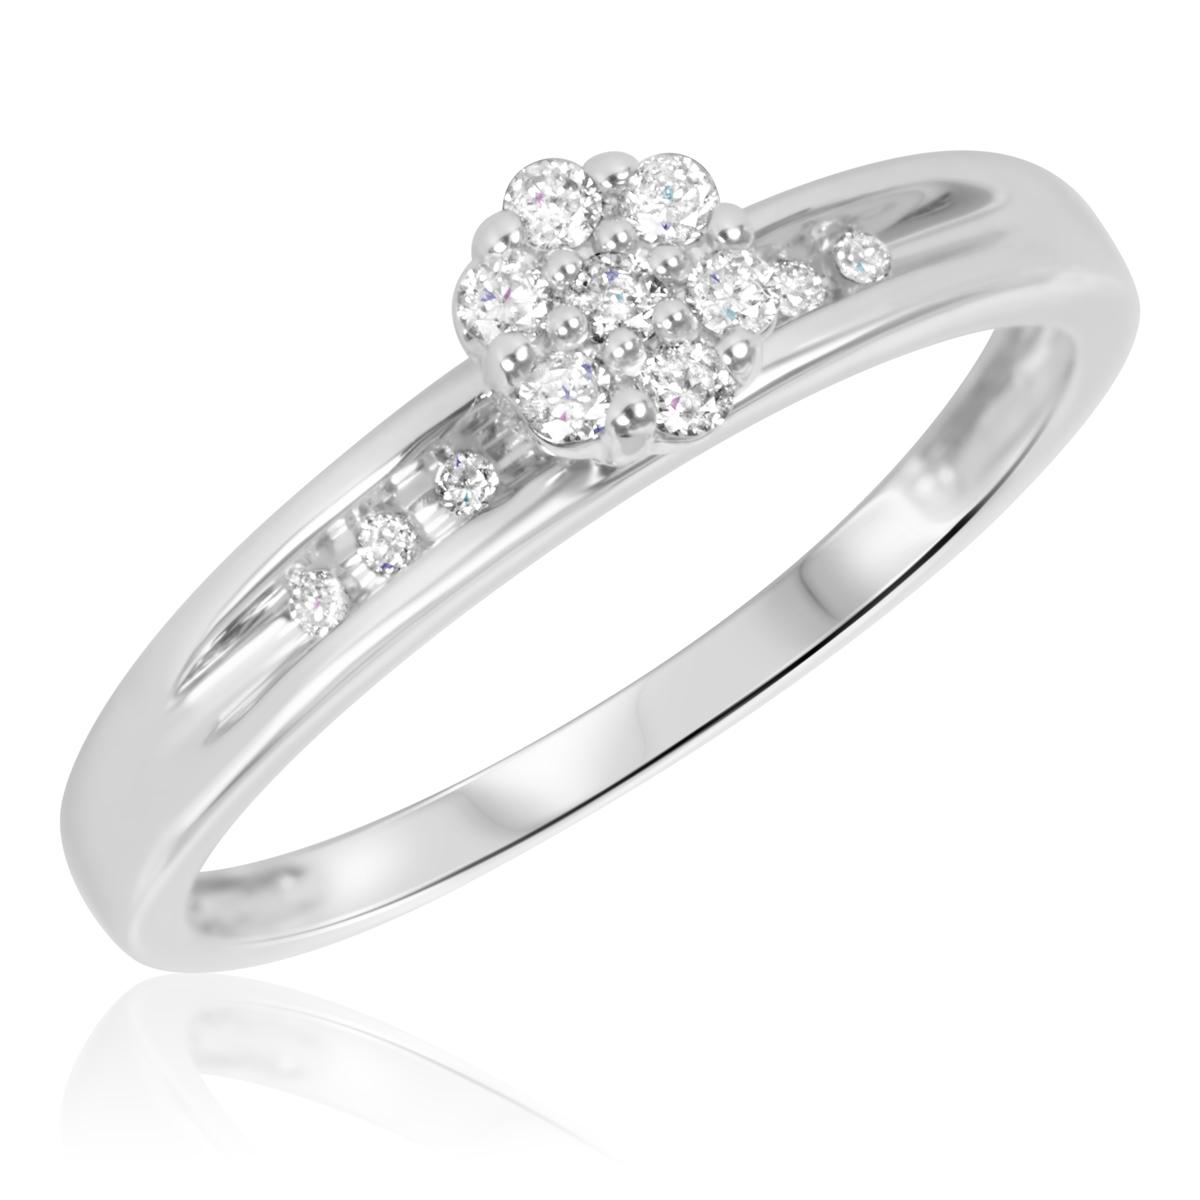 1/6 Carat T.W. Round Cut Diamond Ladies Engagement Ring 14K White Gold- Size 8